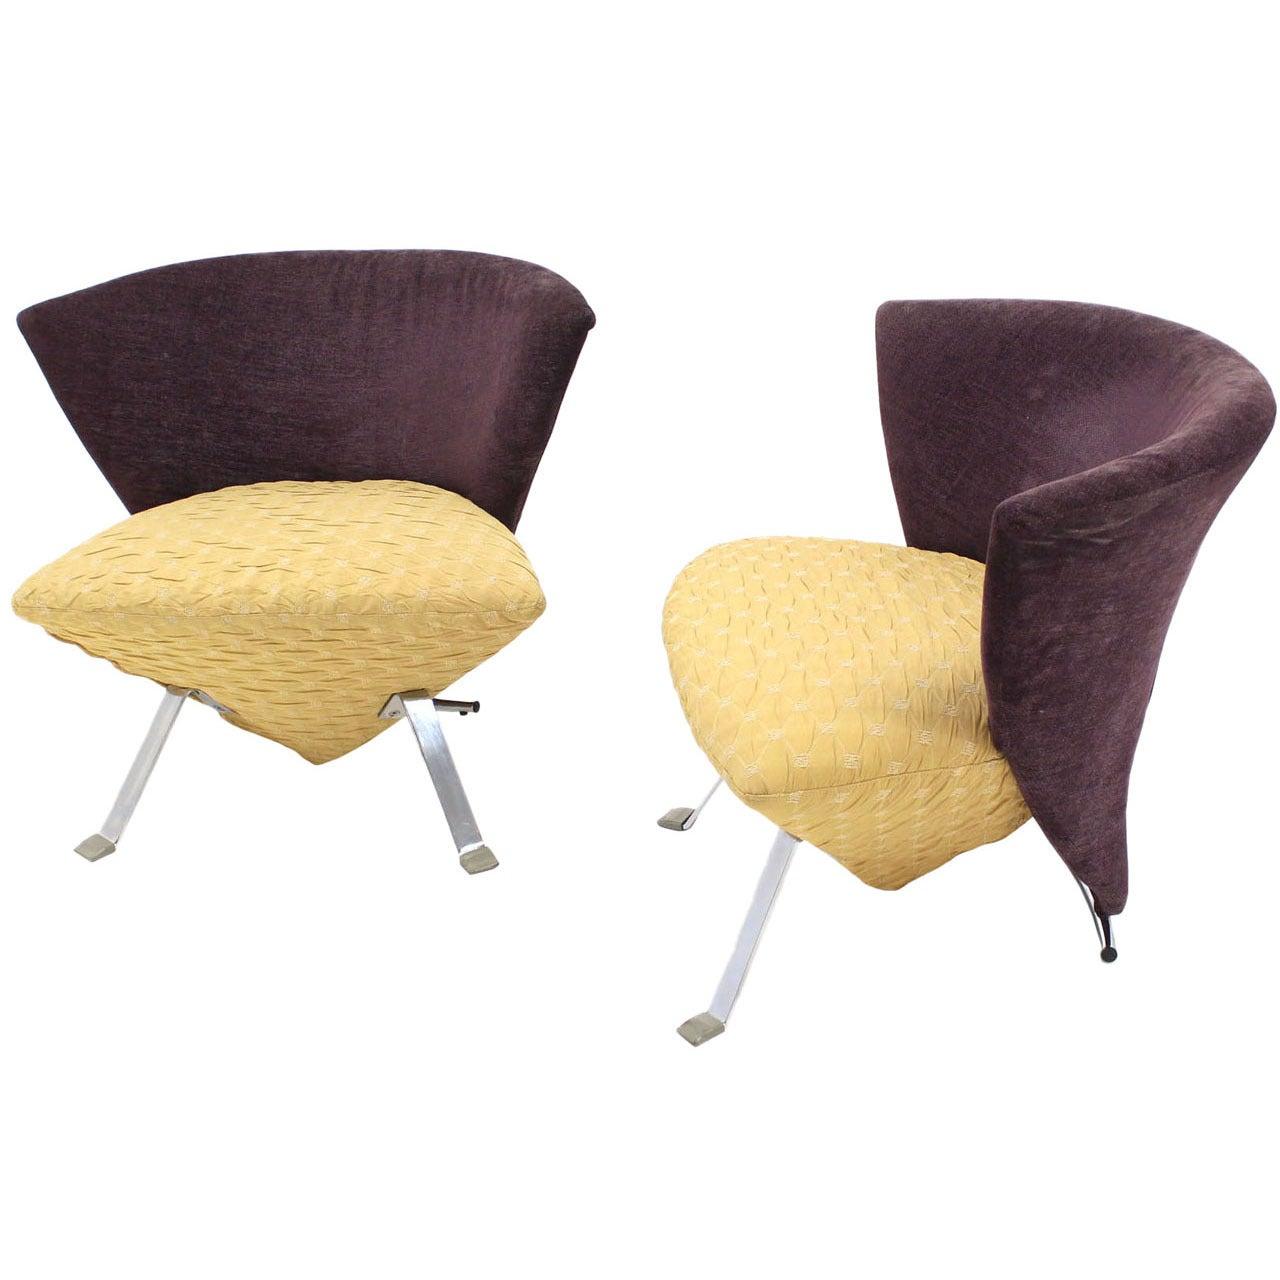 Pair of Saporiti Italian Modern Lounge Chairs